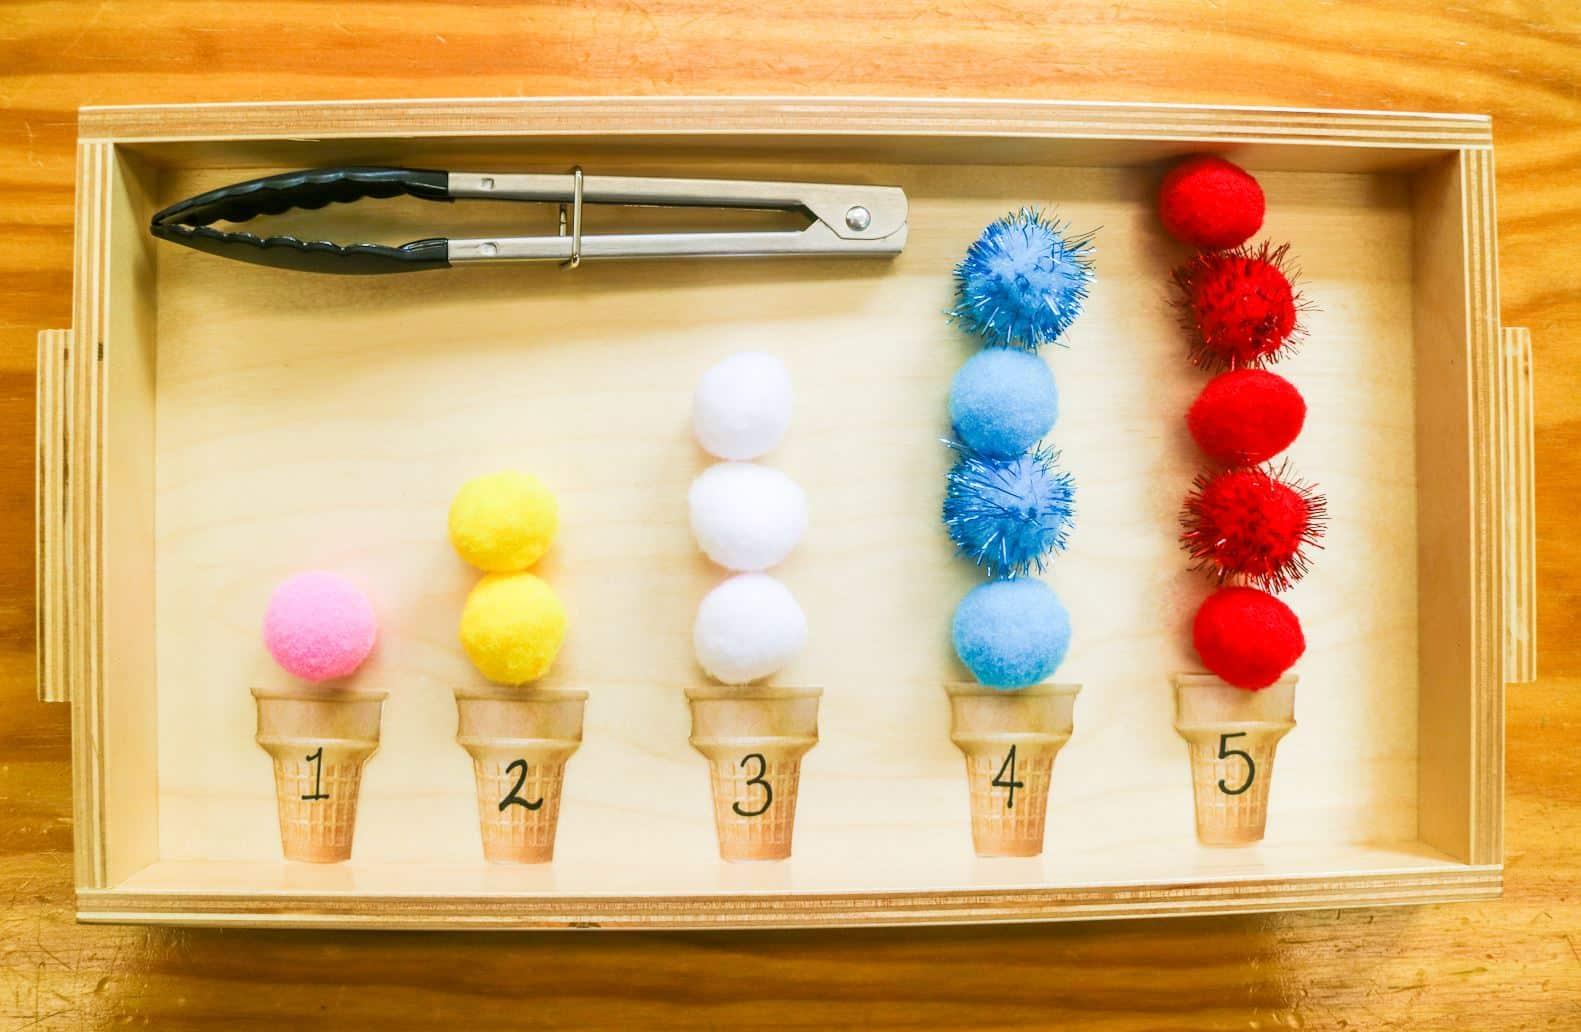 Summer Mathematics Ice Cream Tray